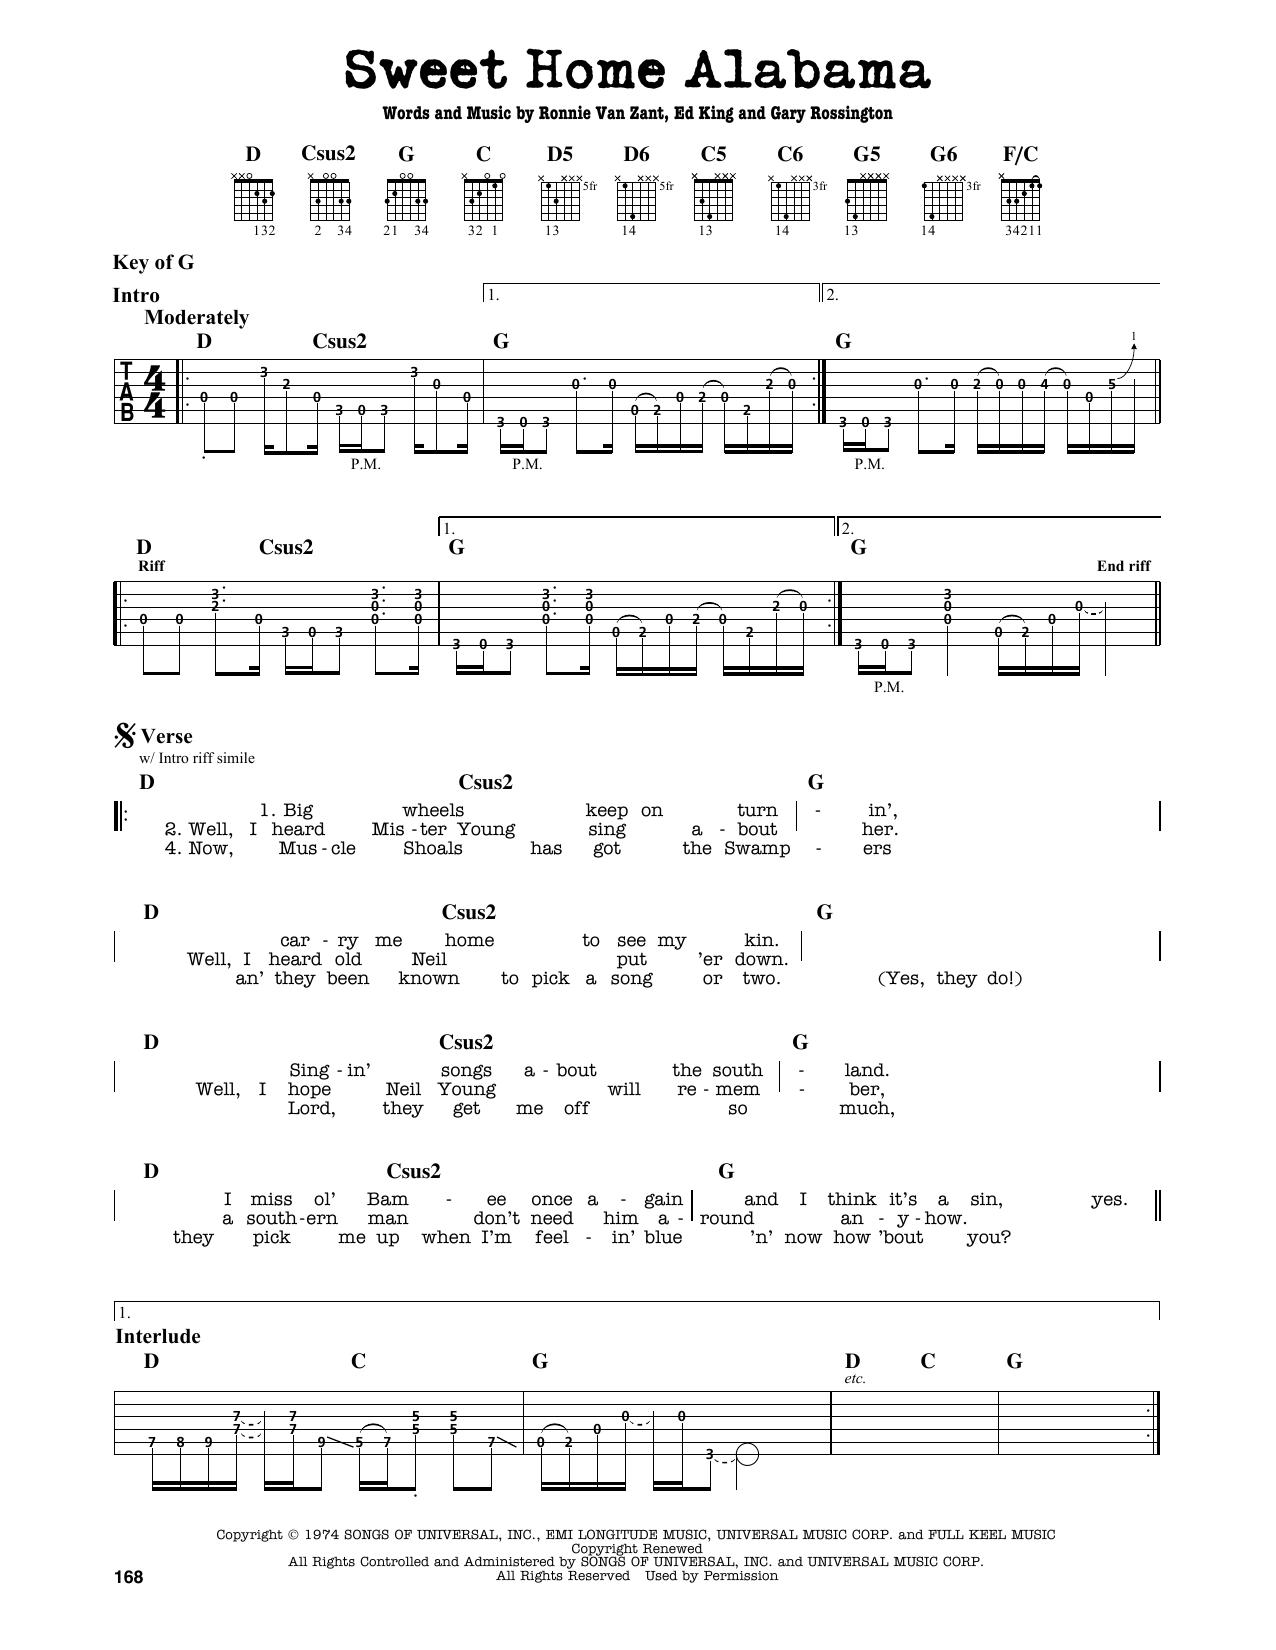 Lynyrd Skynyrd Sweet Home Alabama Sheet Music Notes Chords